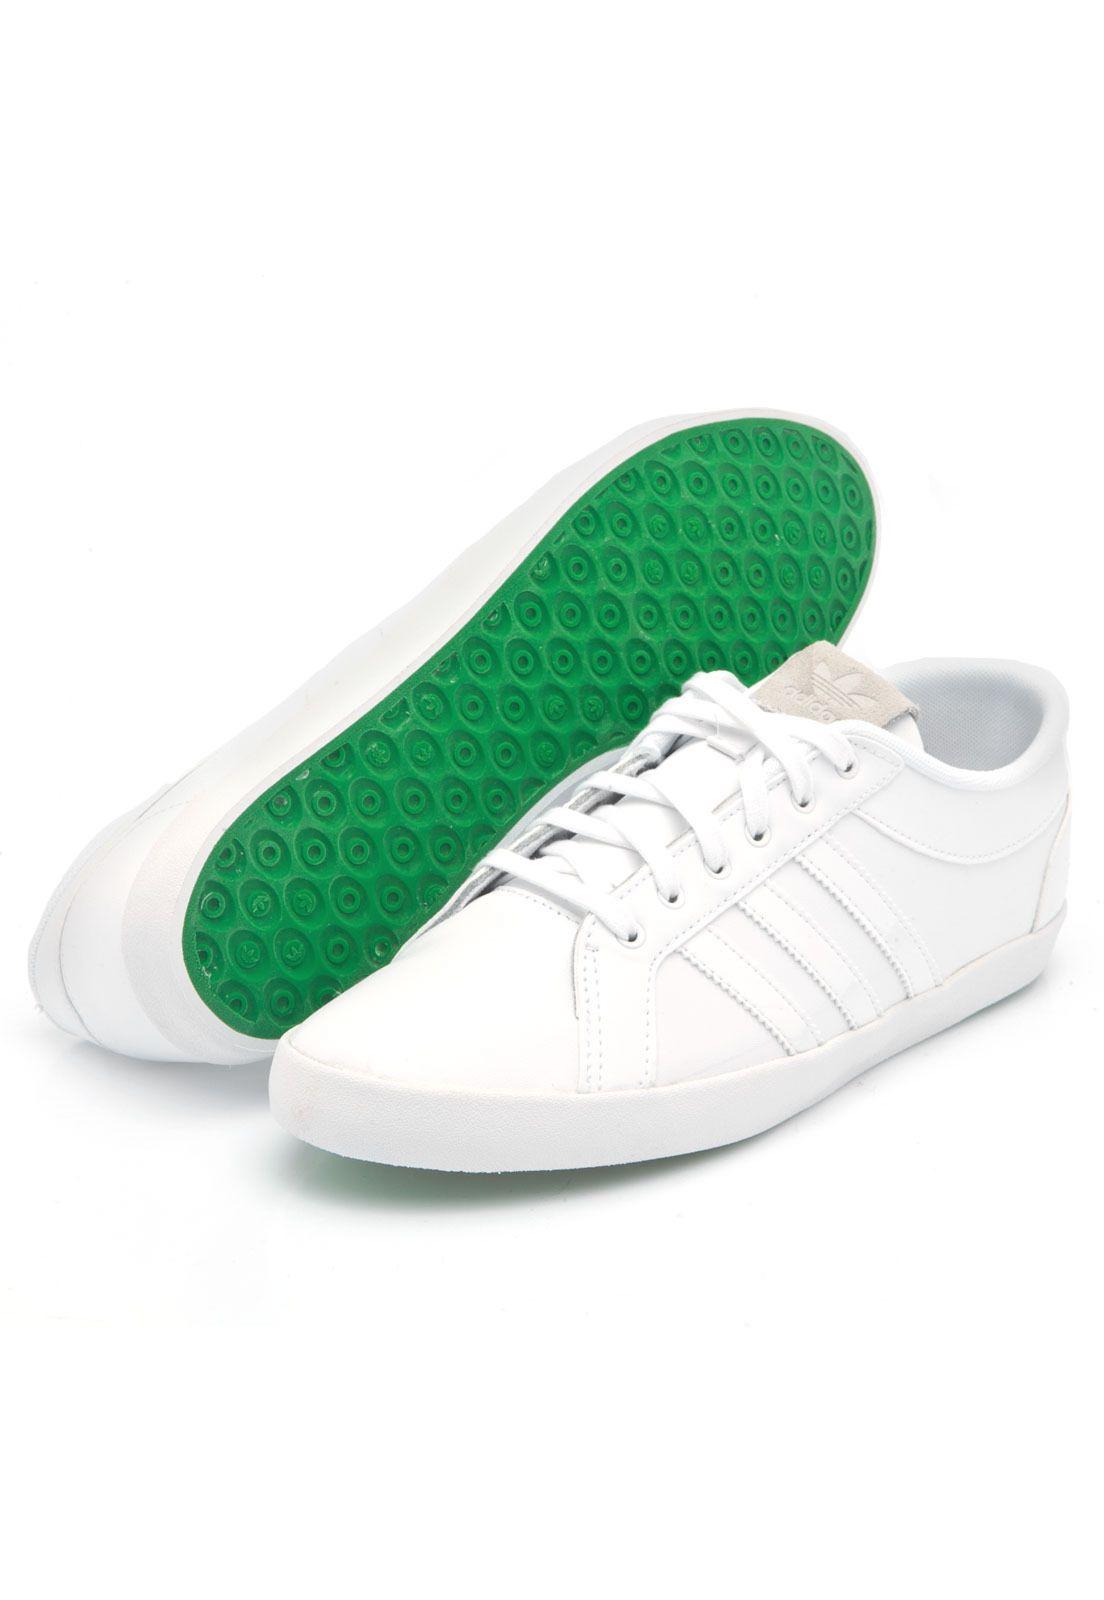 Tênis adidas Originals Adria Ps 3S W Branco